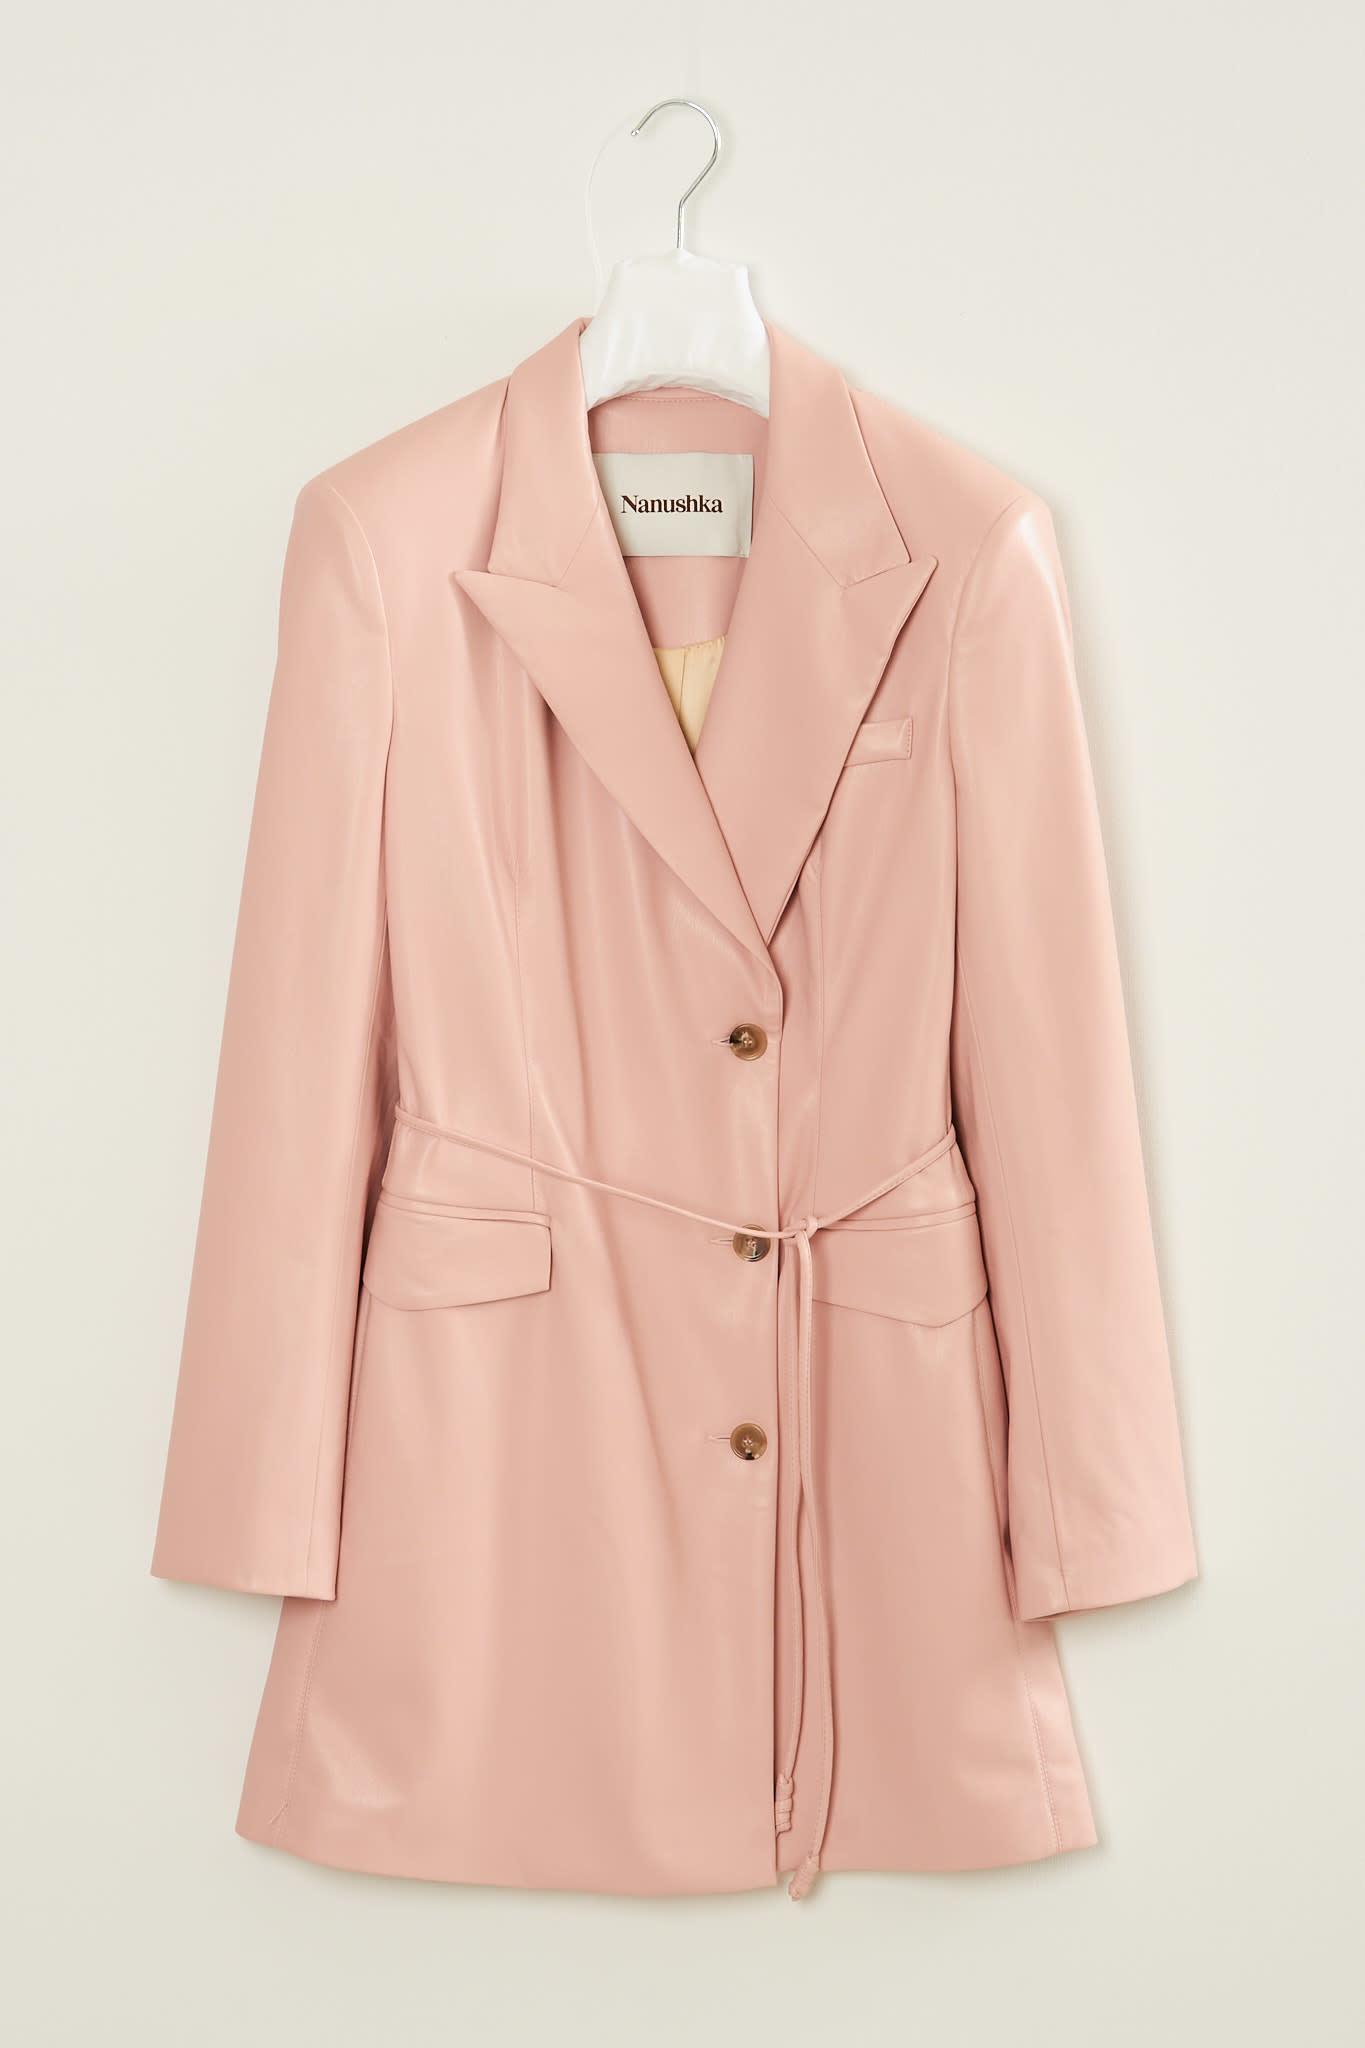 Nanushka Remy vegan leather jacket